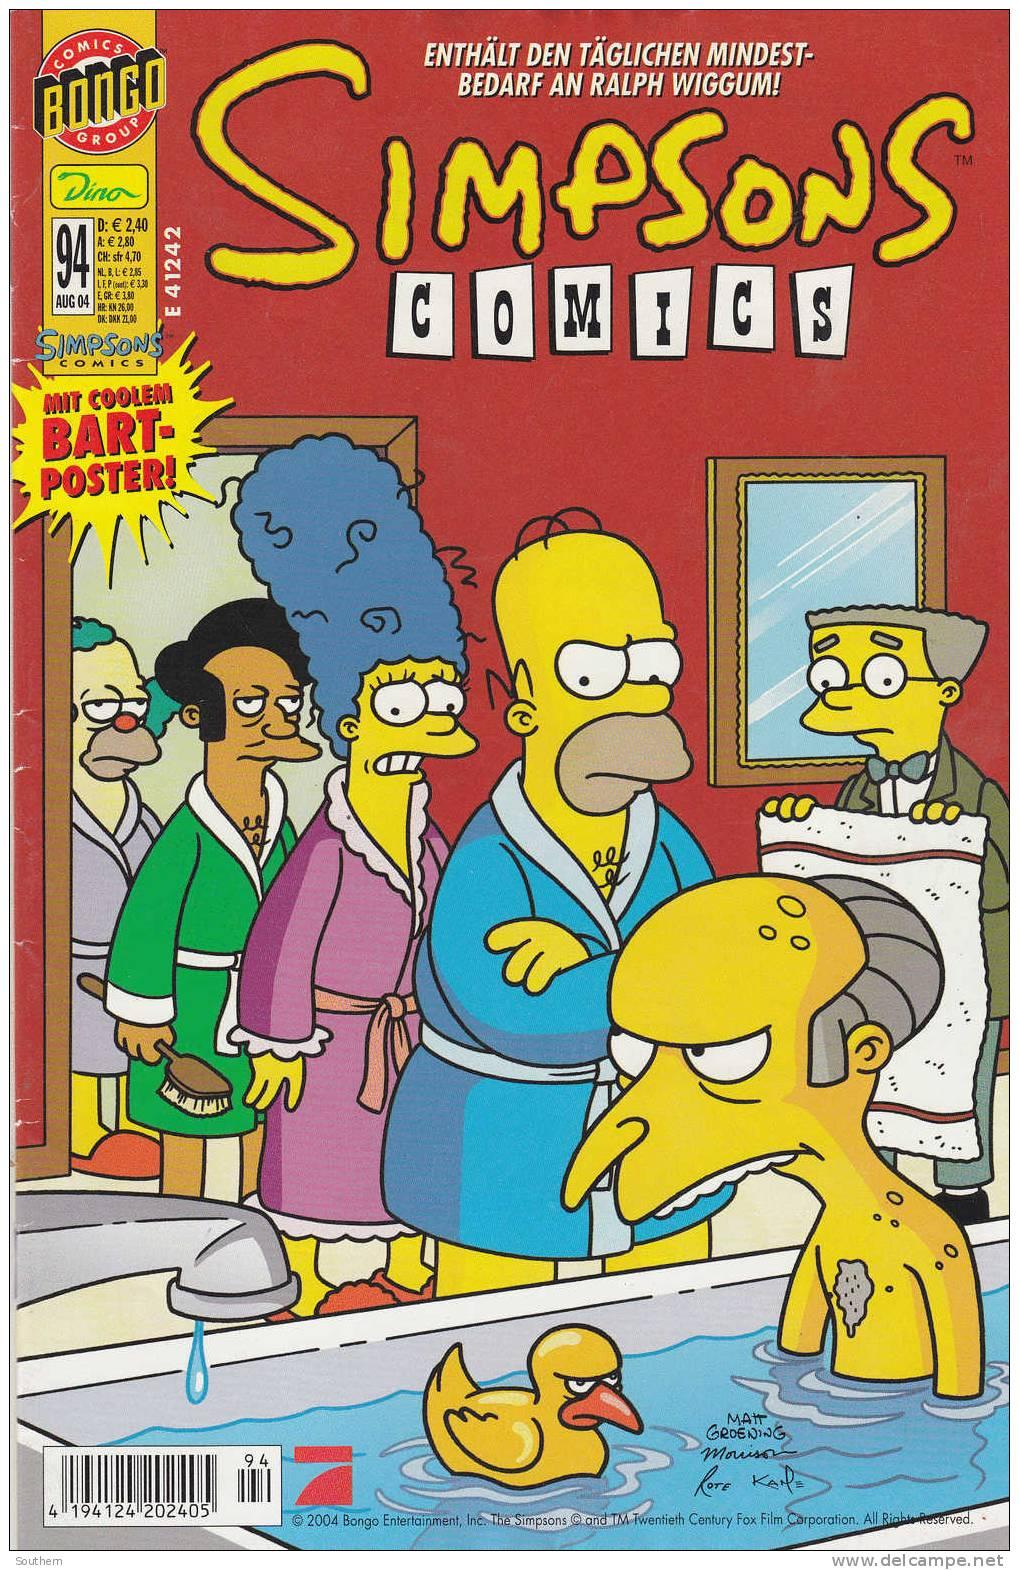 Bart Simpsons N°94 - 08/2004 - Simpsons Comics - Enthalt Den Taglichen Mindest-Bedarf An Ralph Wiggum ! - Simpsons, Die